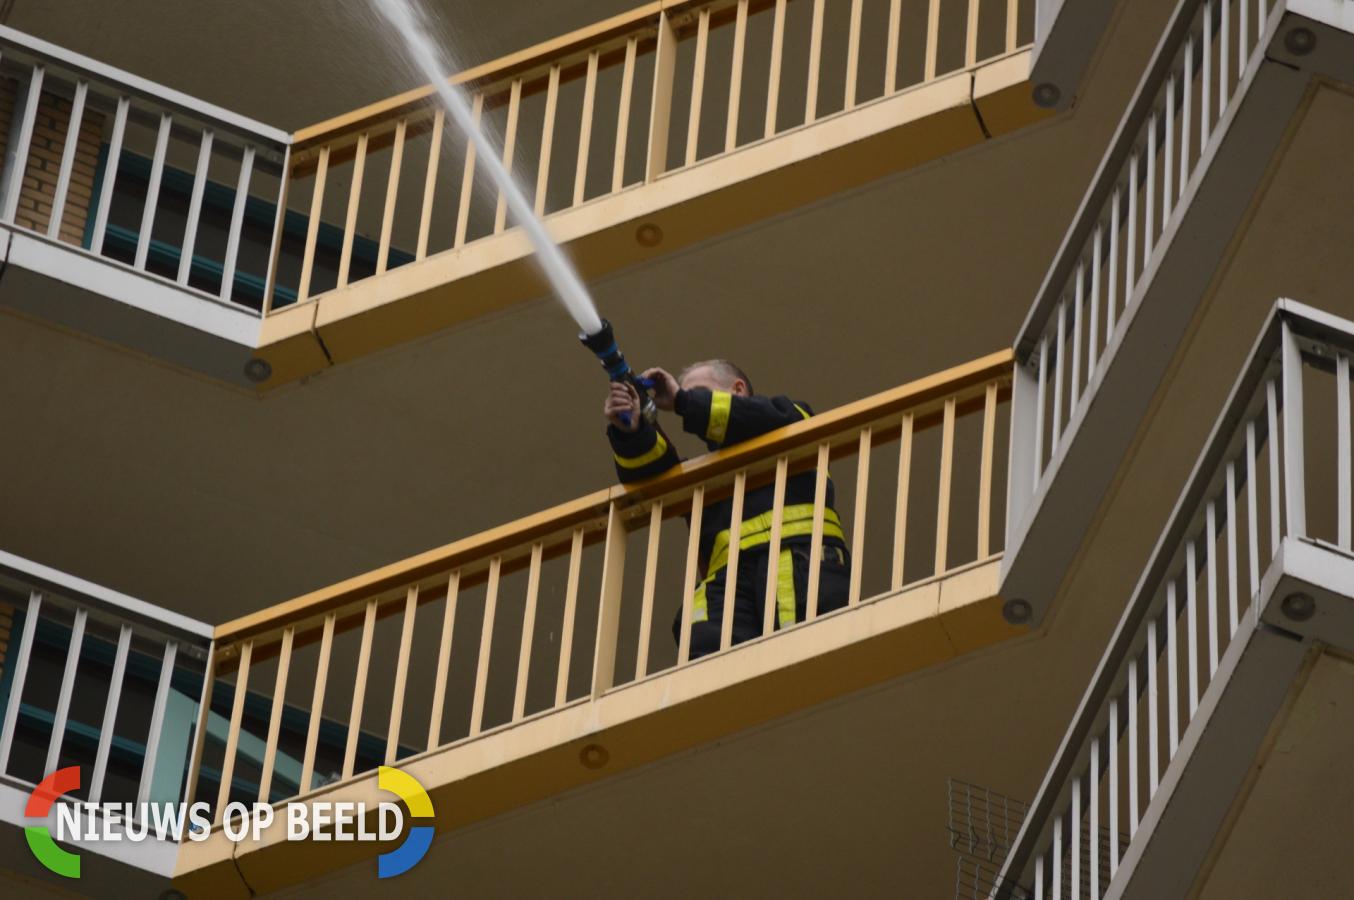 Brandweer houdt oefening in flatgebouw Cornelis Boslaan Zoetermeer